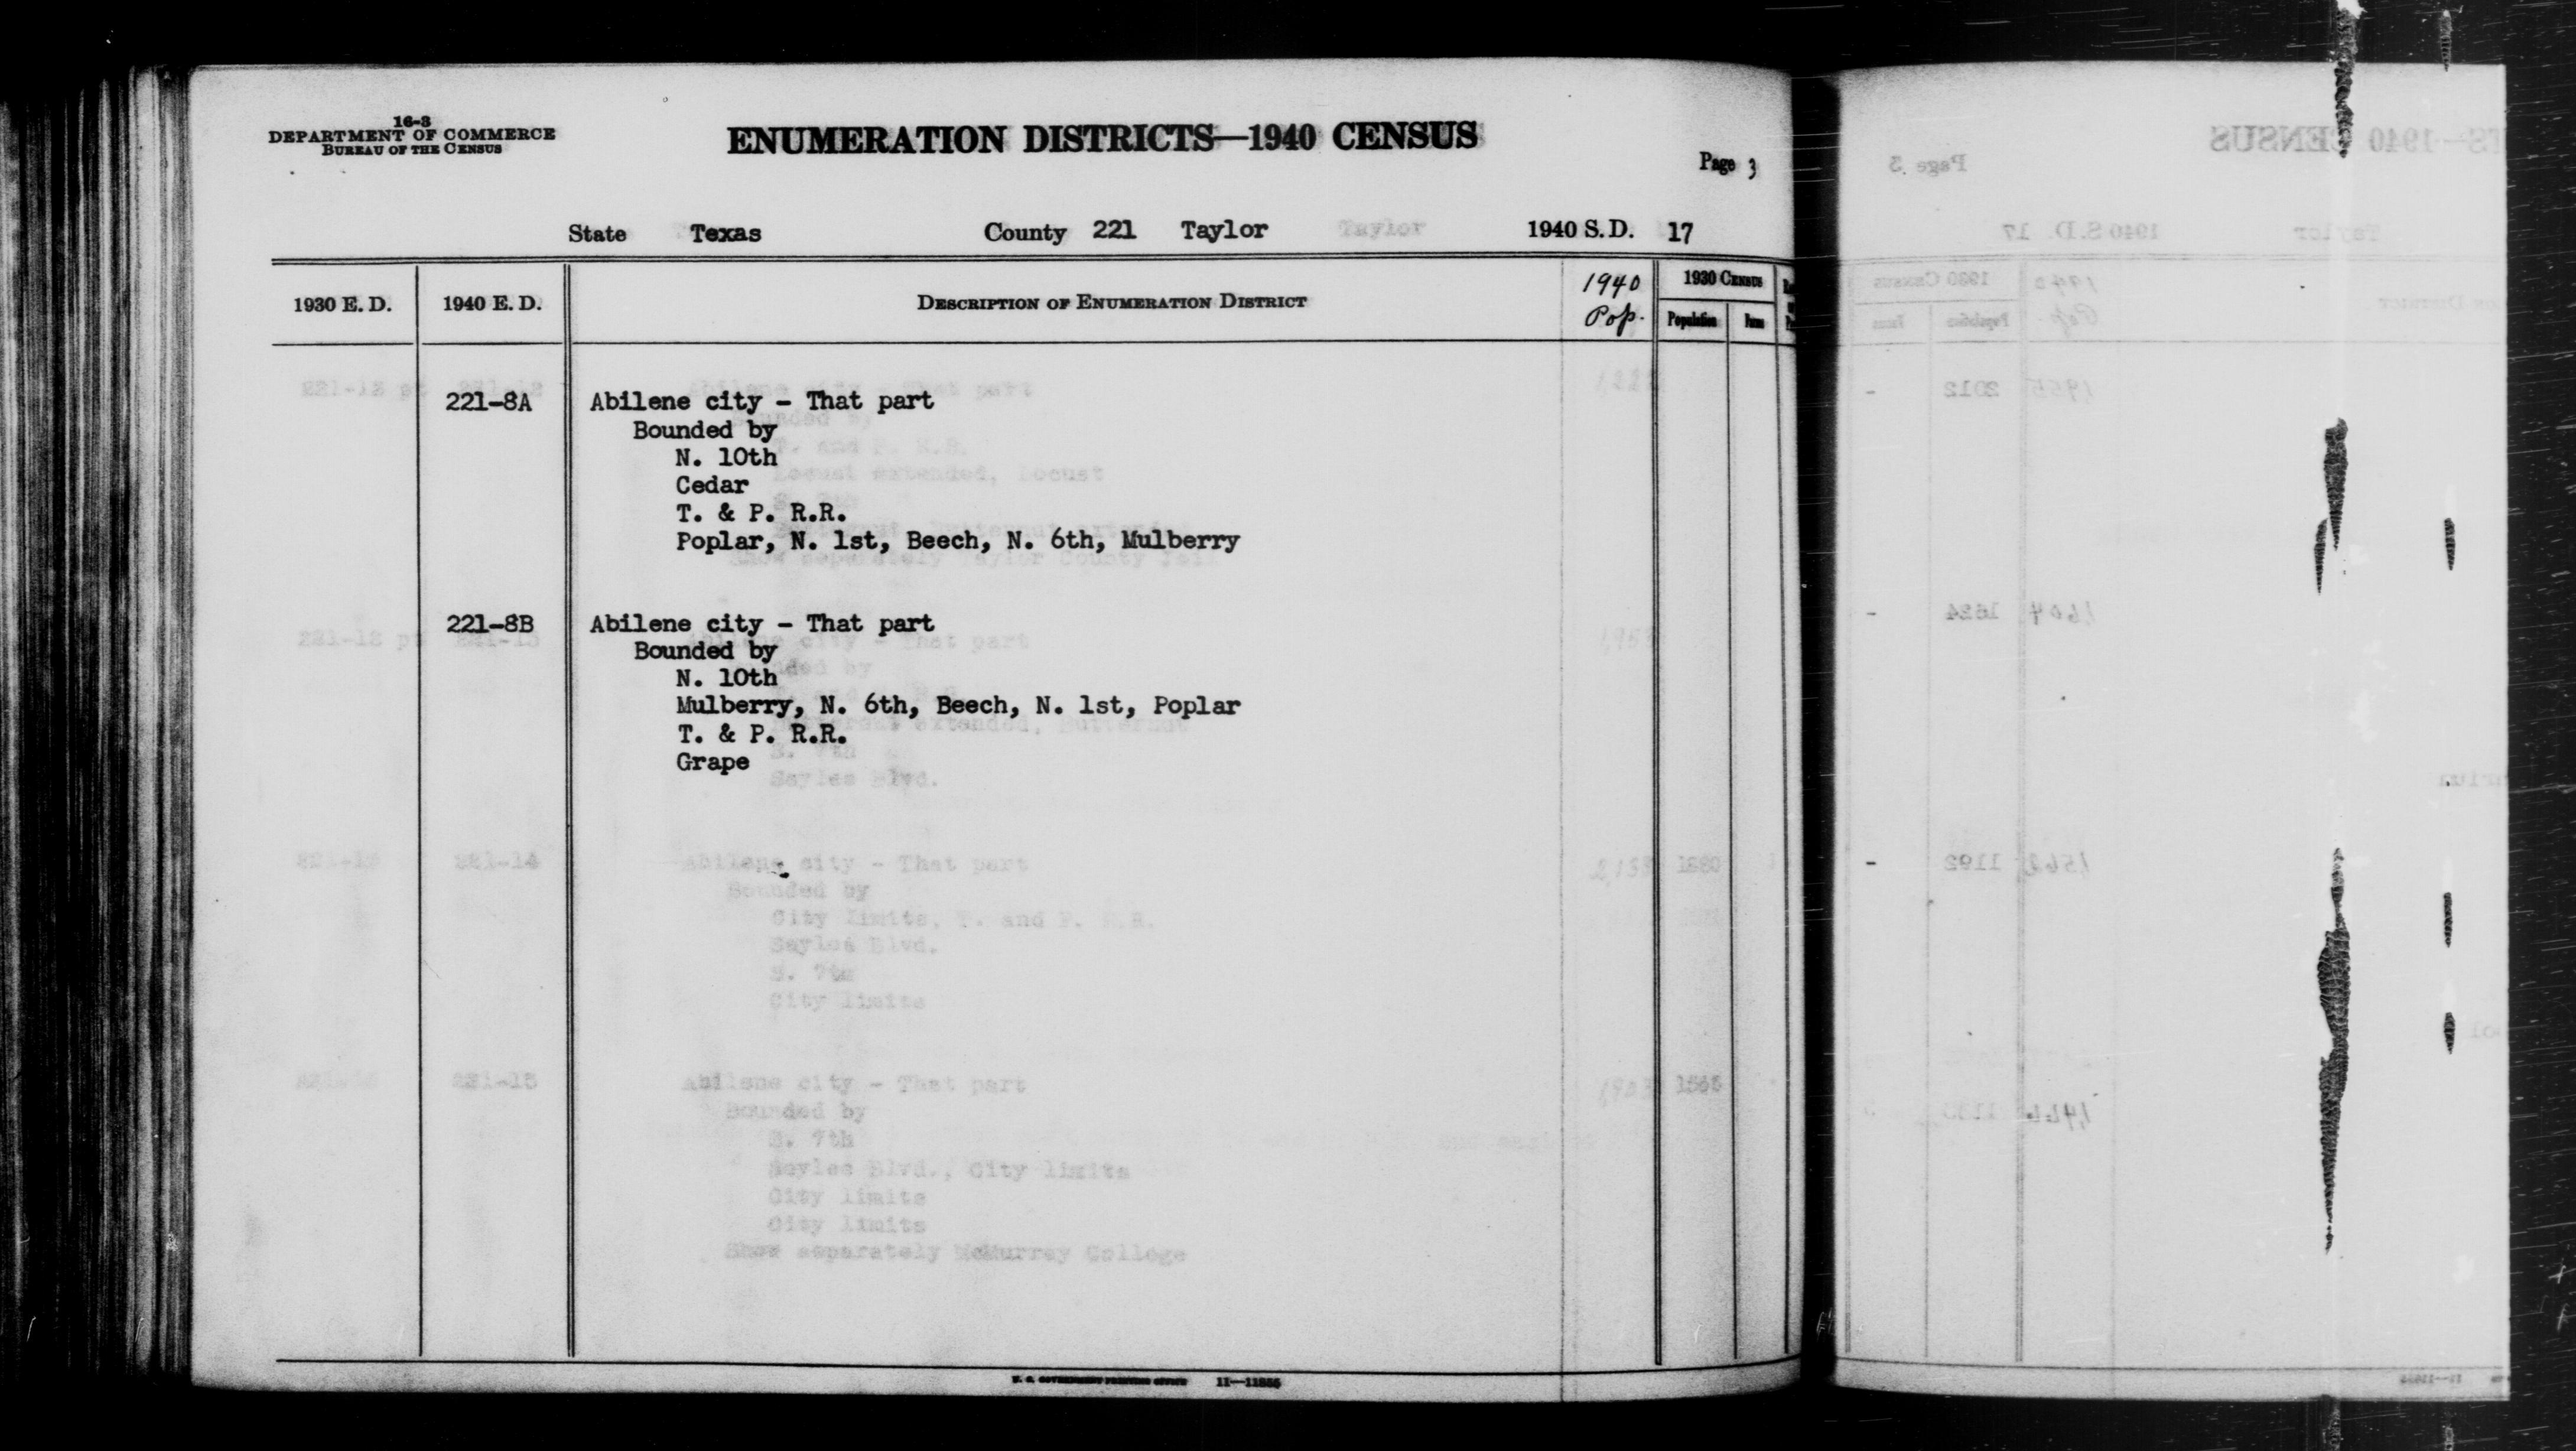 1940 Census Enumeration District Descriptions - Texas - Taylor County - ED 221-8A, ED 221-8B